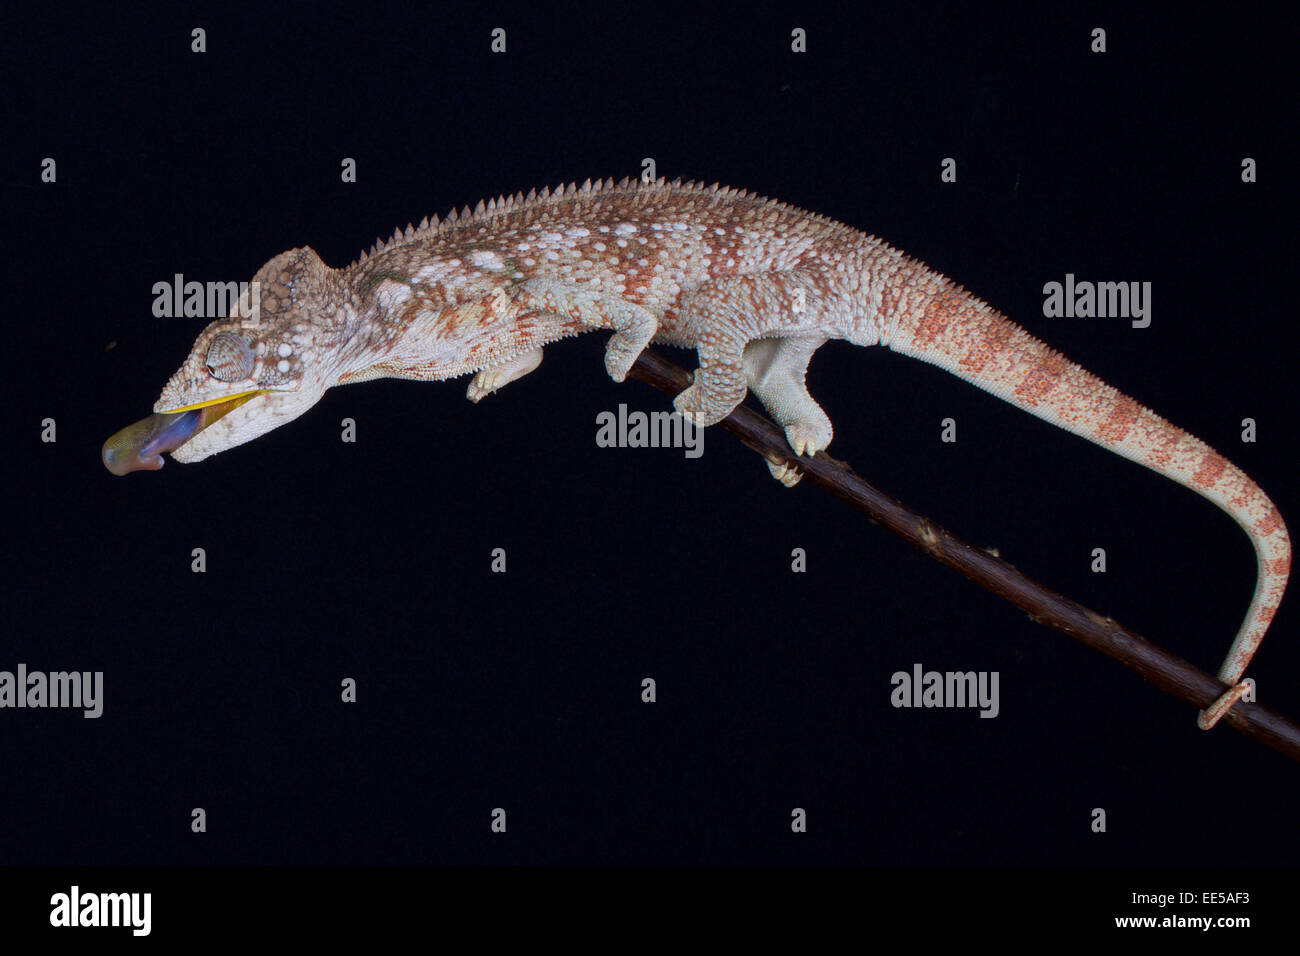 shooting chameleon / Furcifer oustaleti - Stock Image